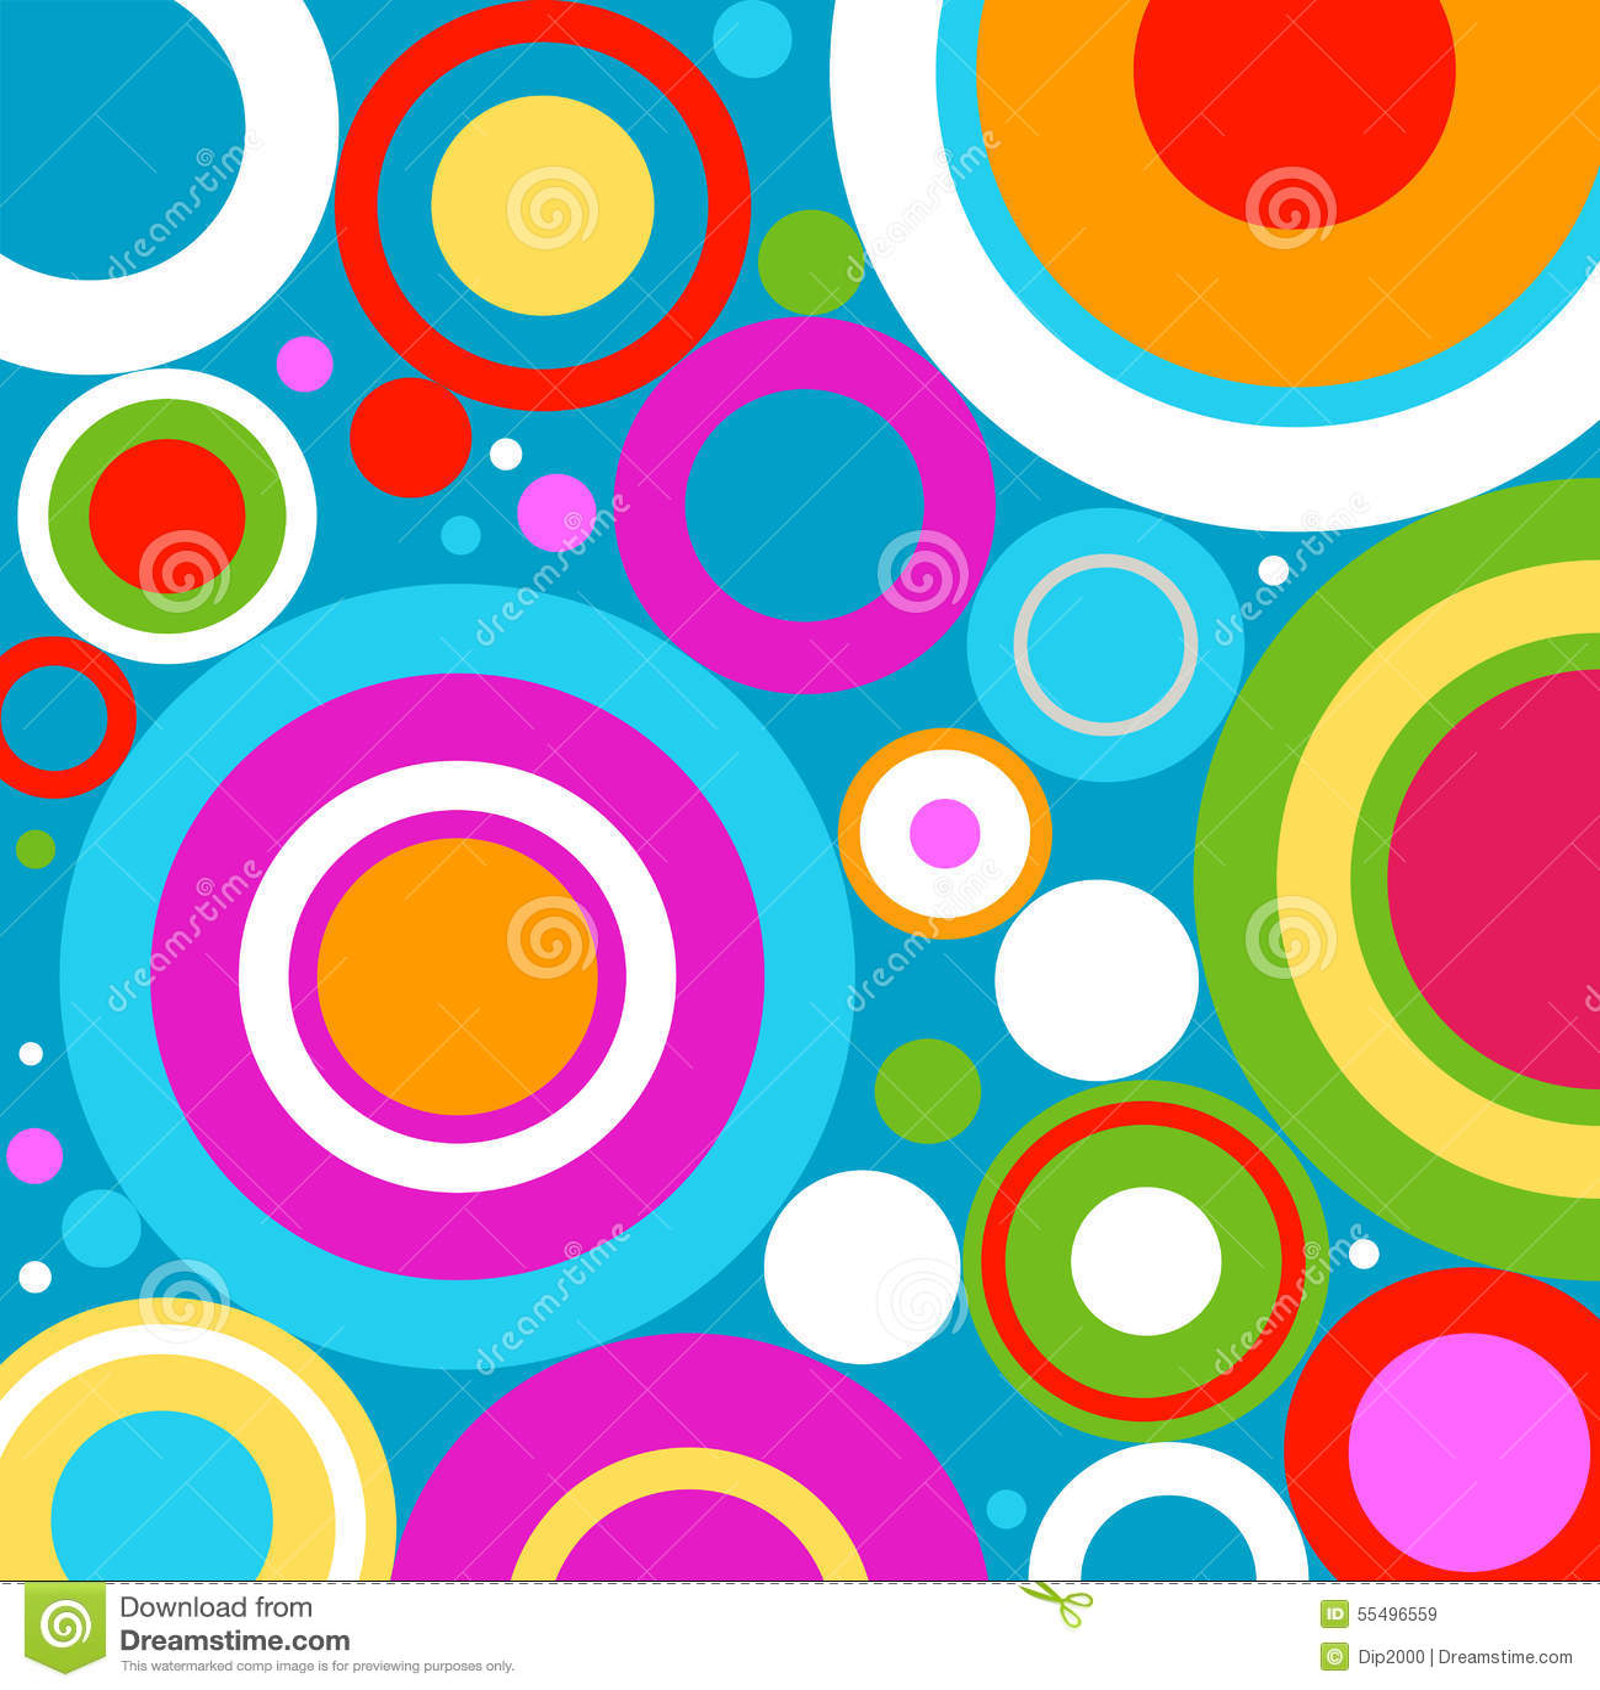 Retro Circles Stock Vector - Image: 55496559